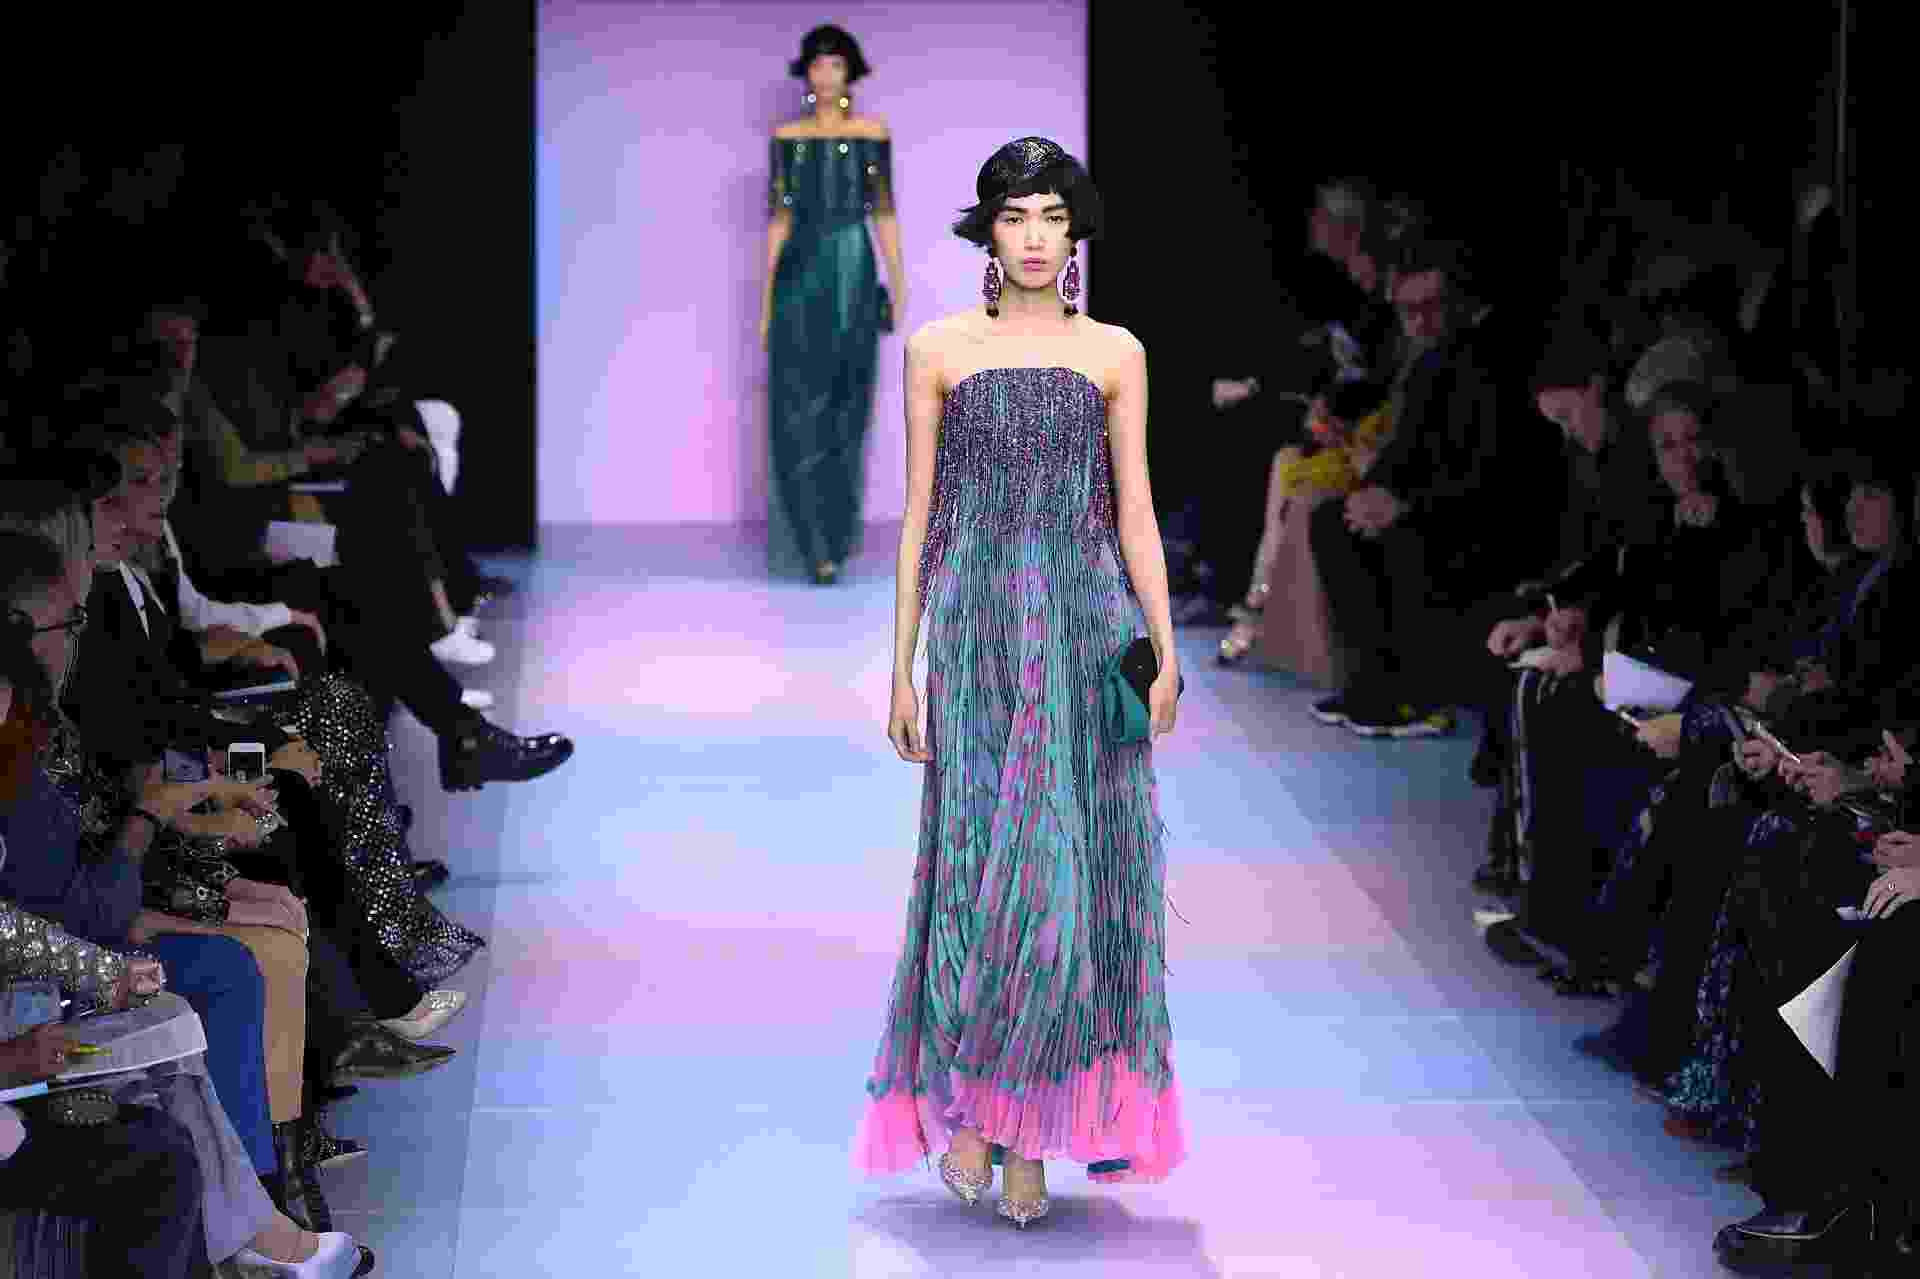 Desfile da Armani na Semana de Moda de Paris - CHRISTOPHE ARCHAMBAULT / AFP